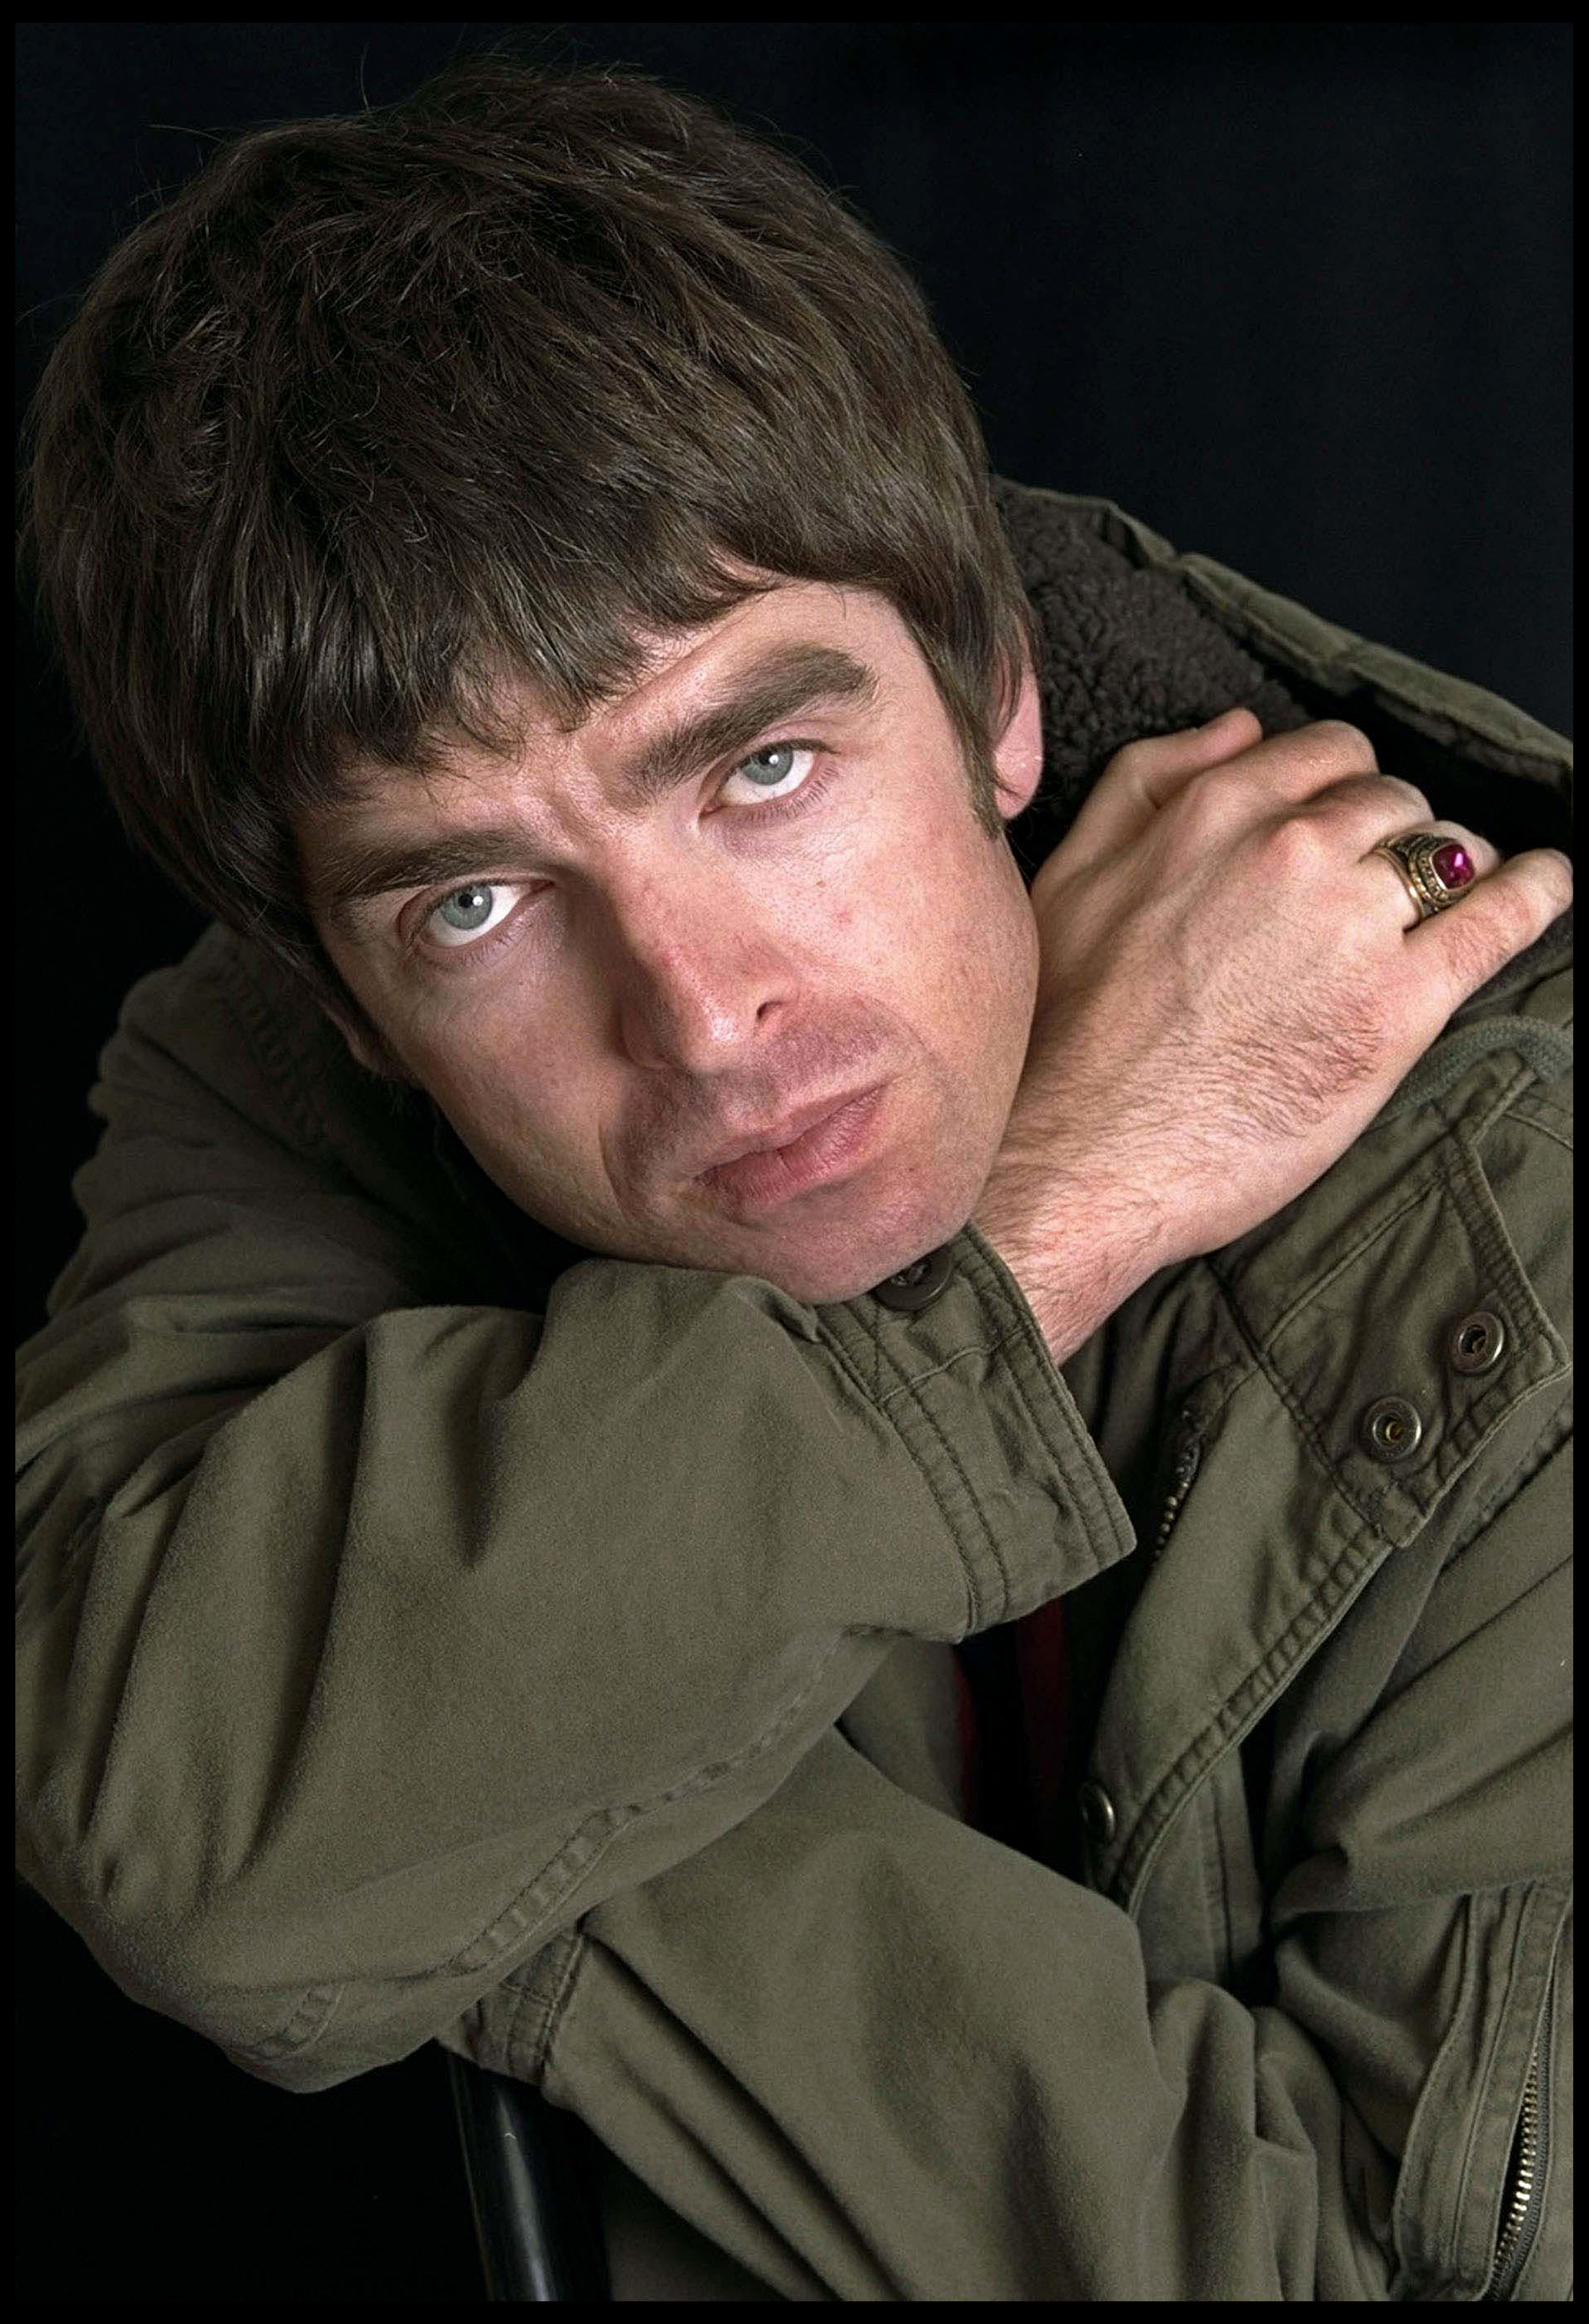 Noel Gallagher, musician